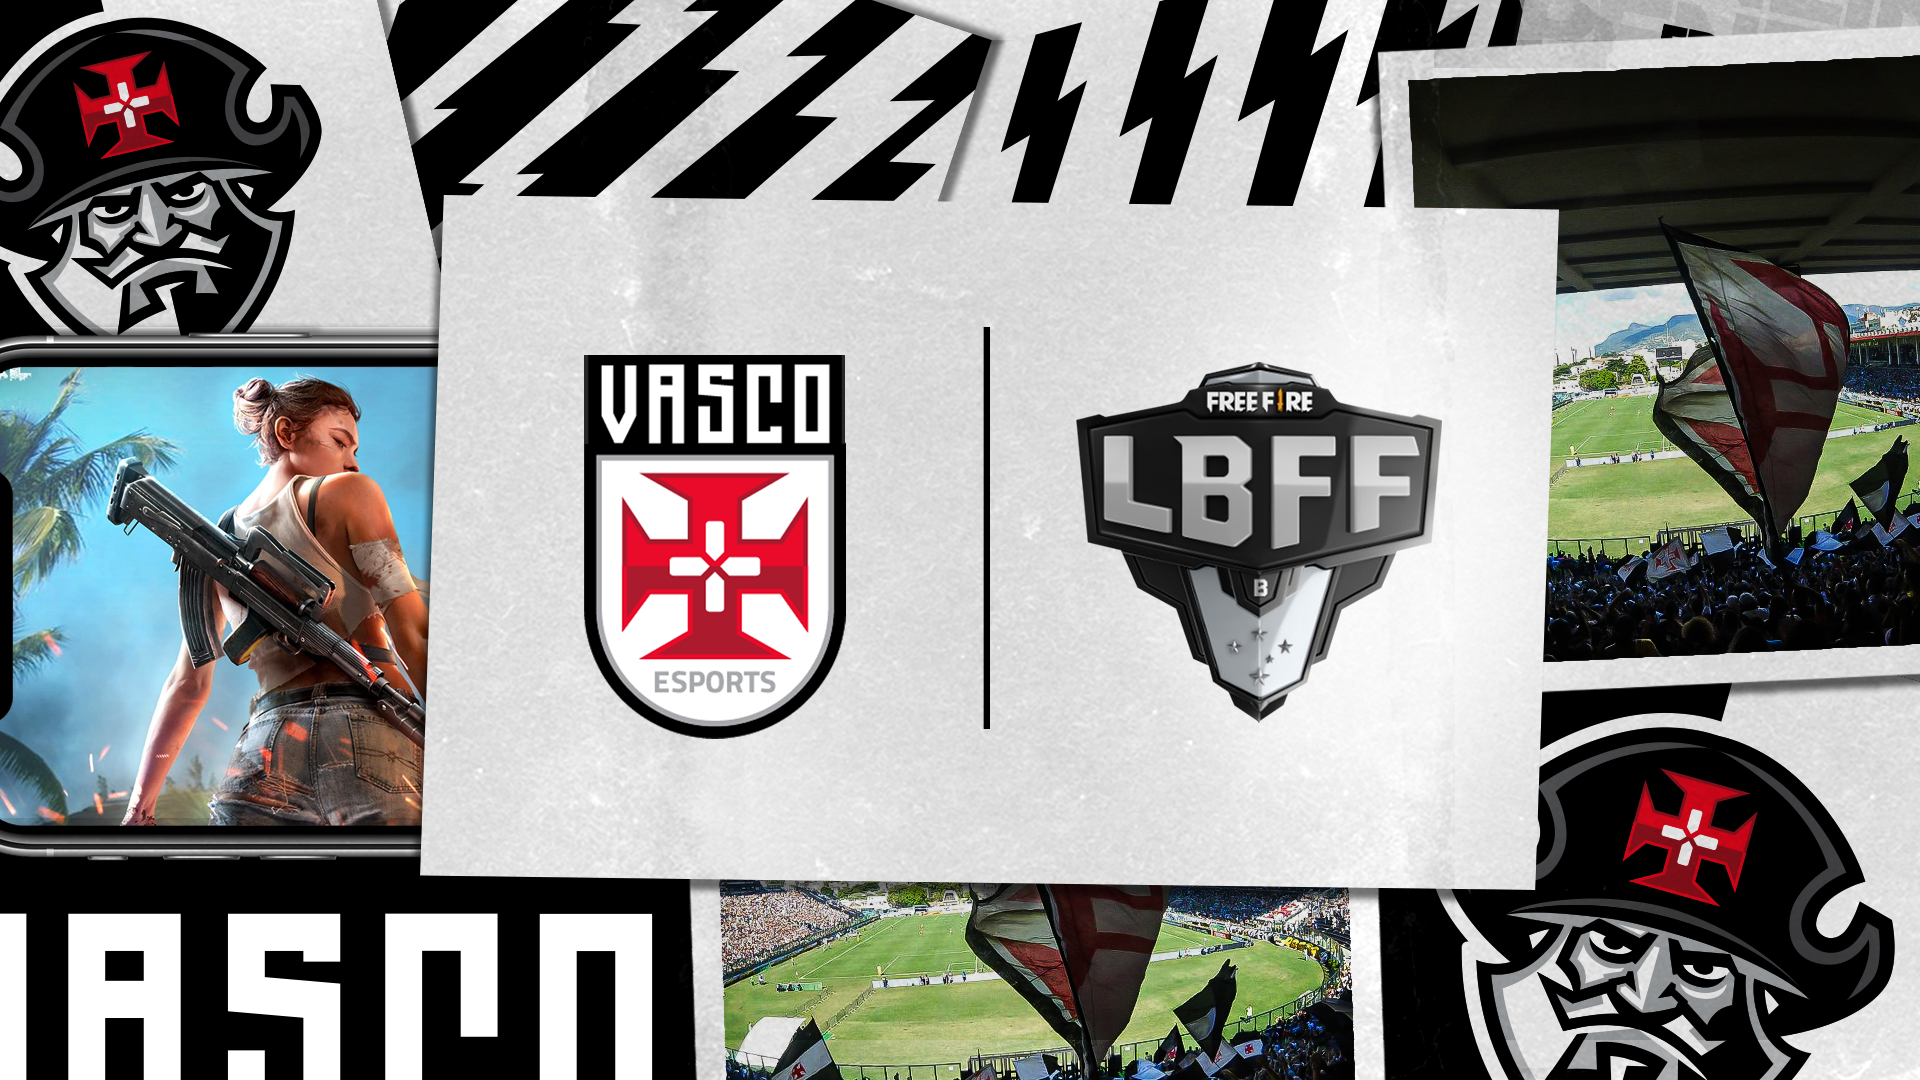 LBFF Série B: Vasco anuncia que disputará LBFF 6 série B